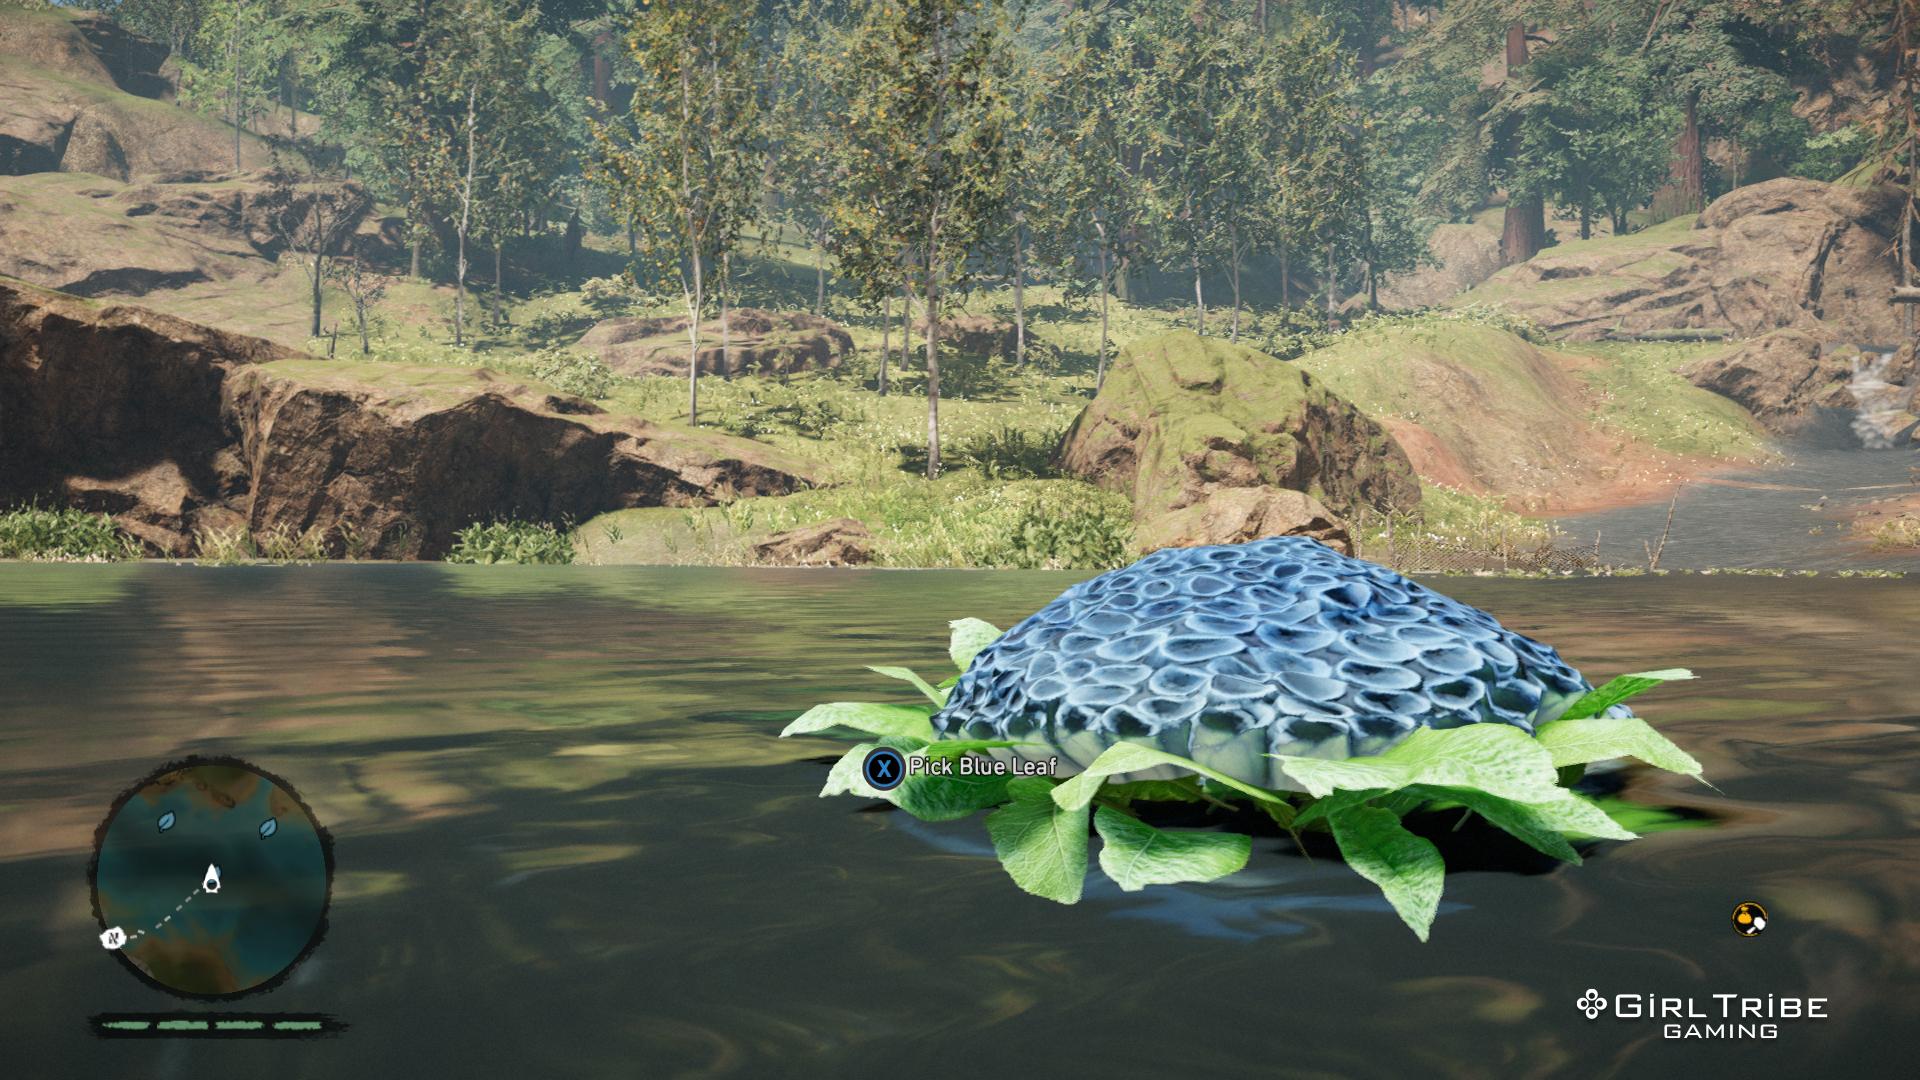 Far-Cry-Primal-Screenshot-6-w.jpg